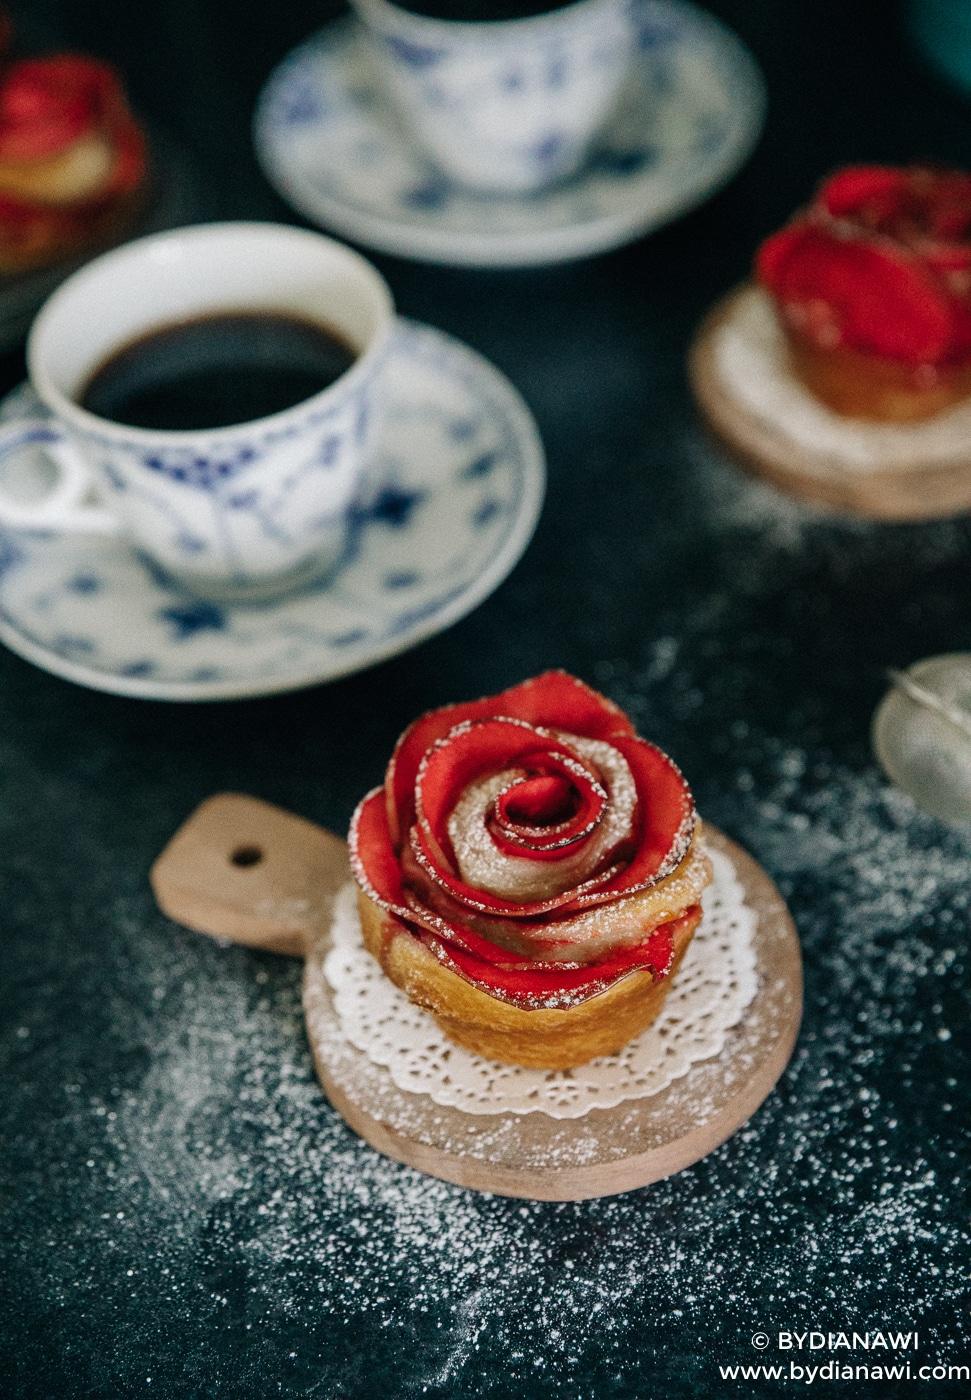 nemme kager, croissant opskrift, kaffe, danerolles